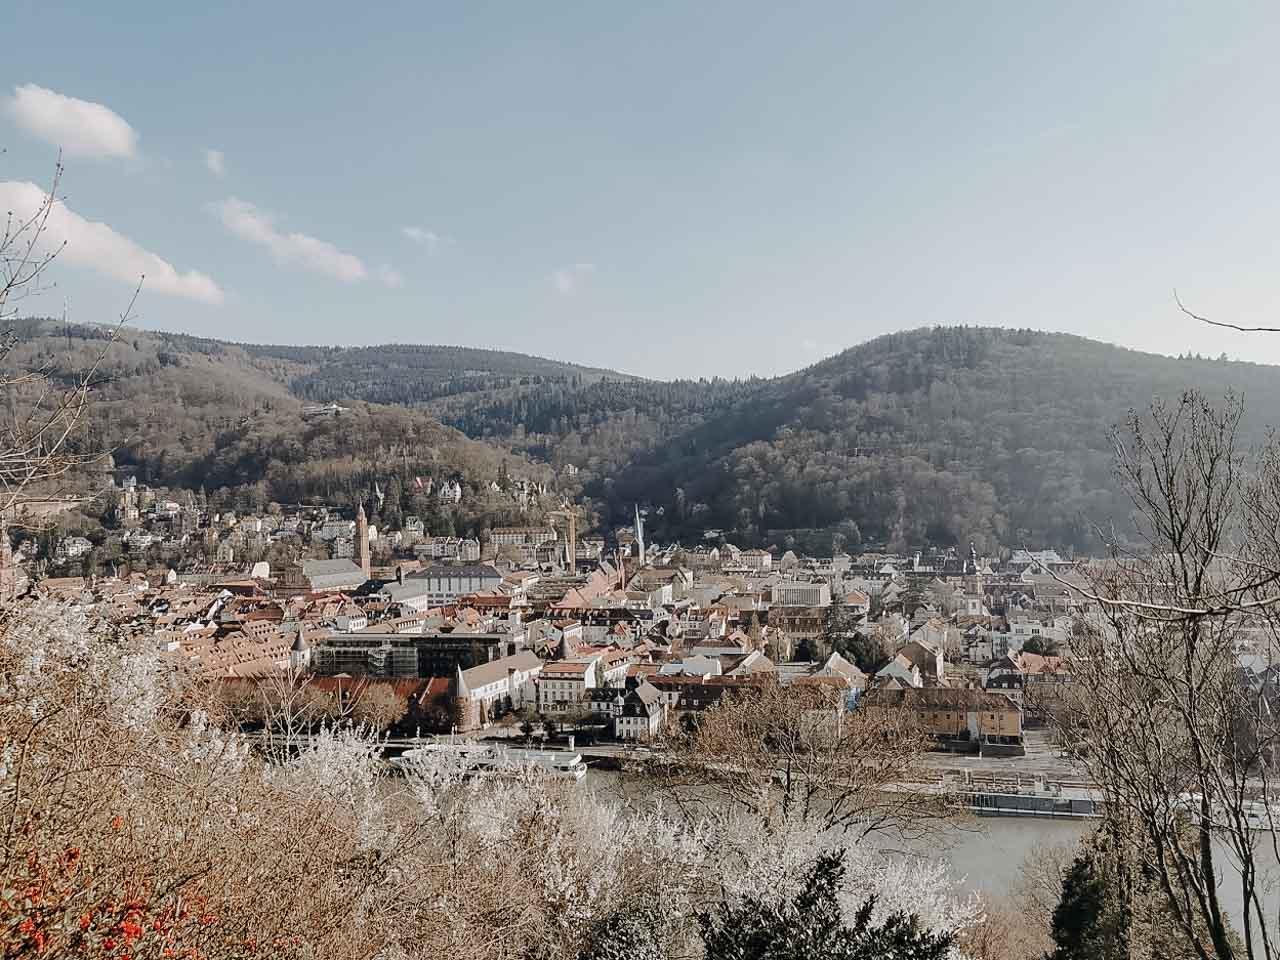 Blick auf die Altstadt am Fluss